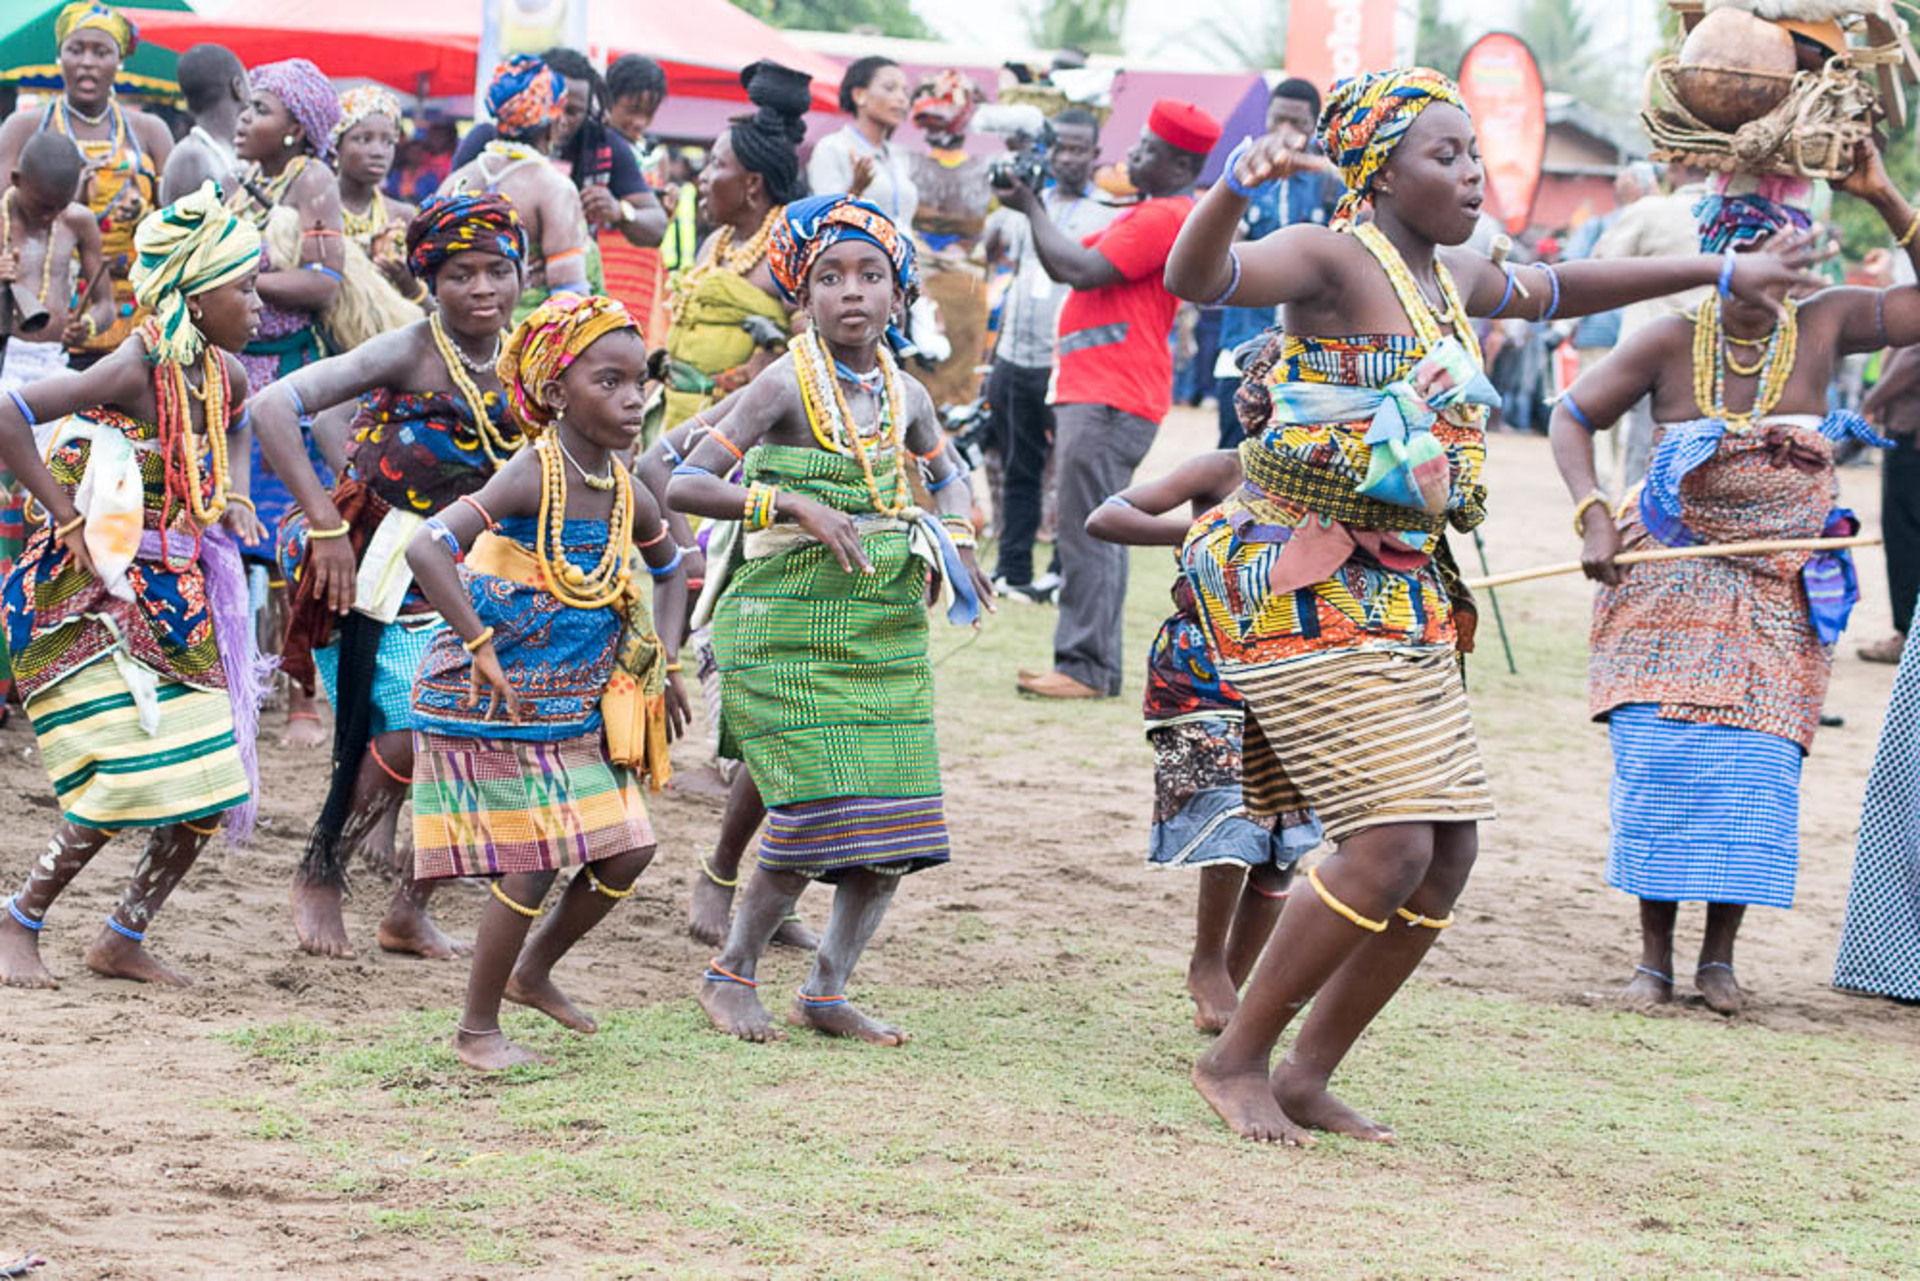 Women dancing at a cultural festival in Ghana